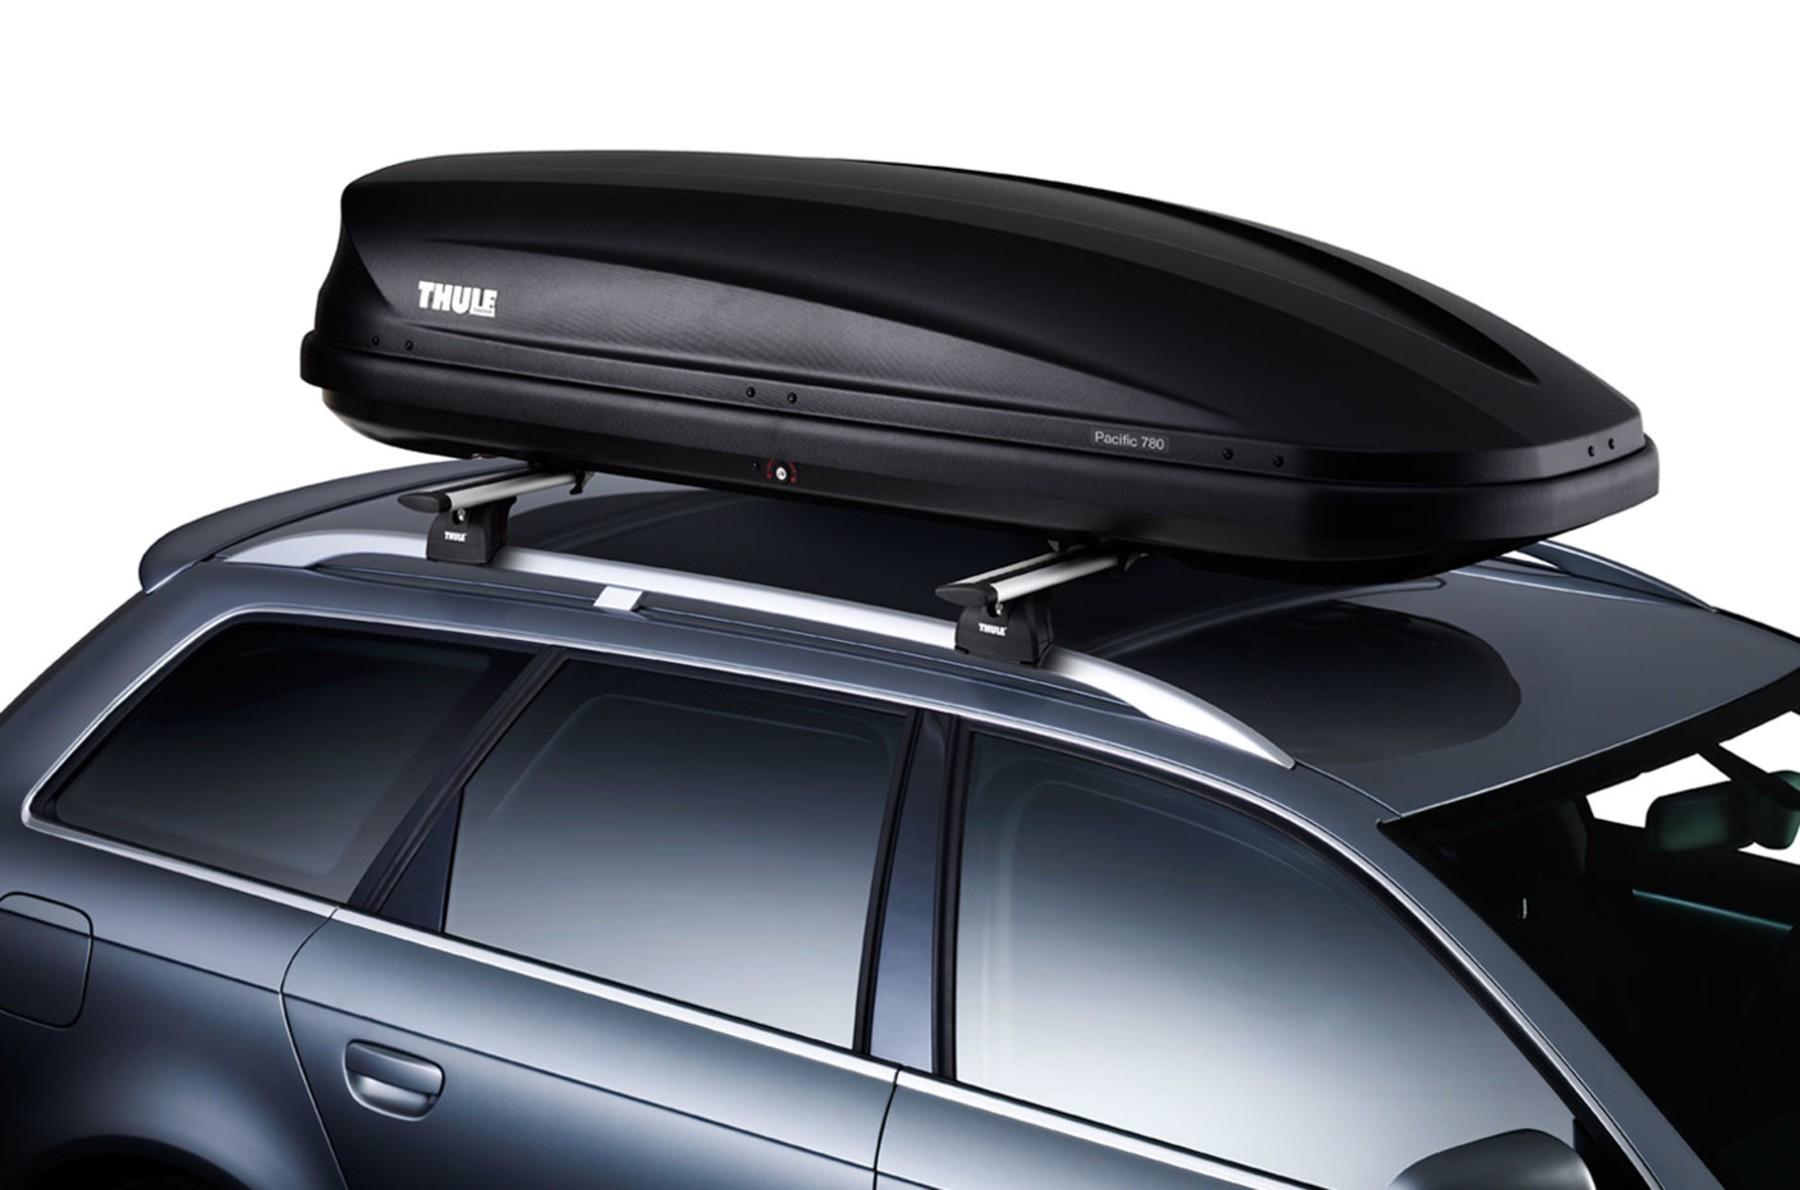 Video - Thule bagage dakkoffer handig het hele jaar door